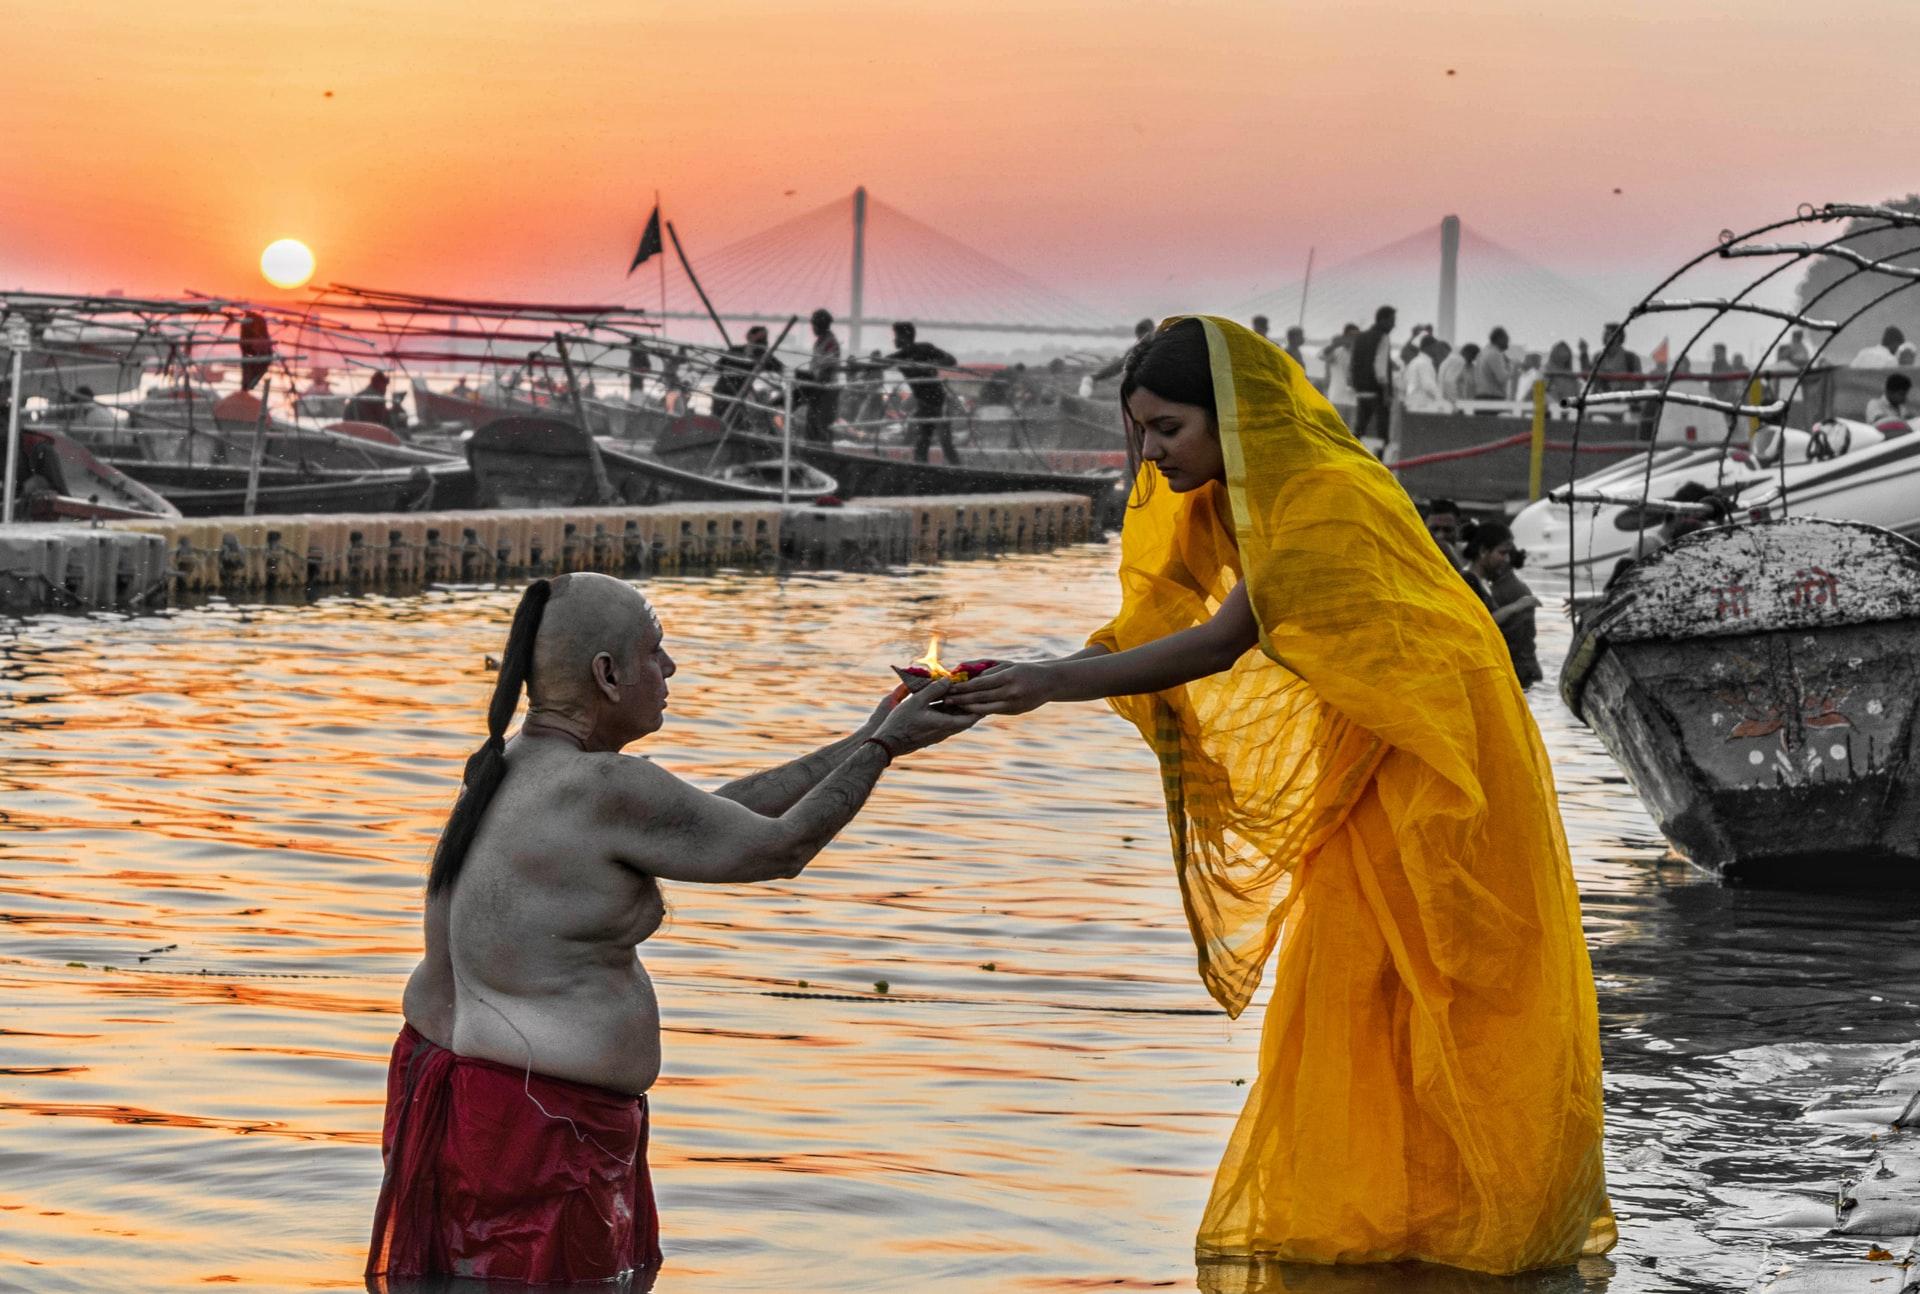 sari dhoti and hindu dharma